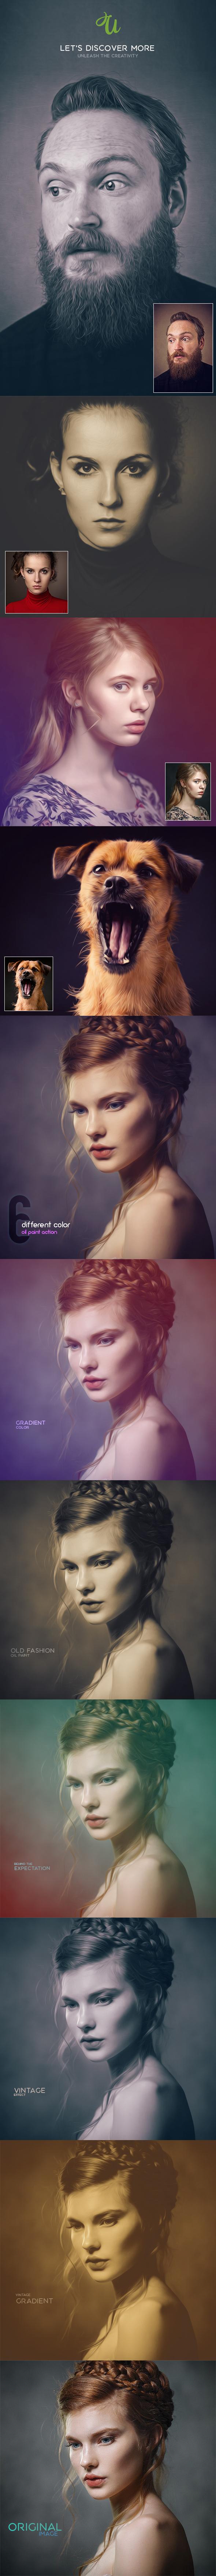 GraphicRiver Color Gradient Action 20668666